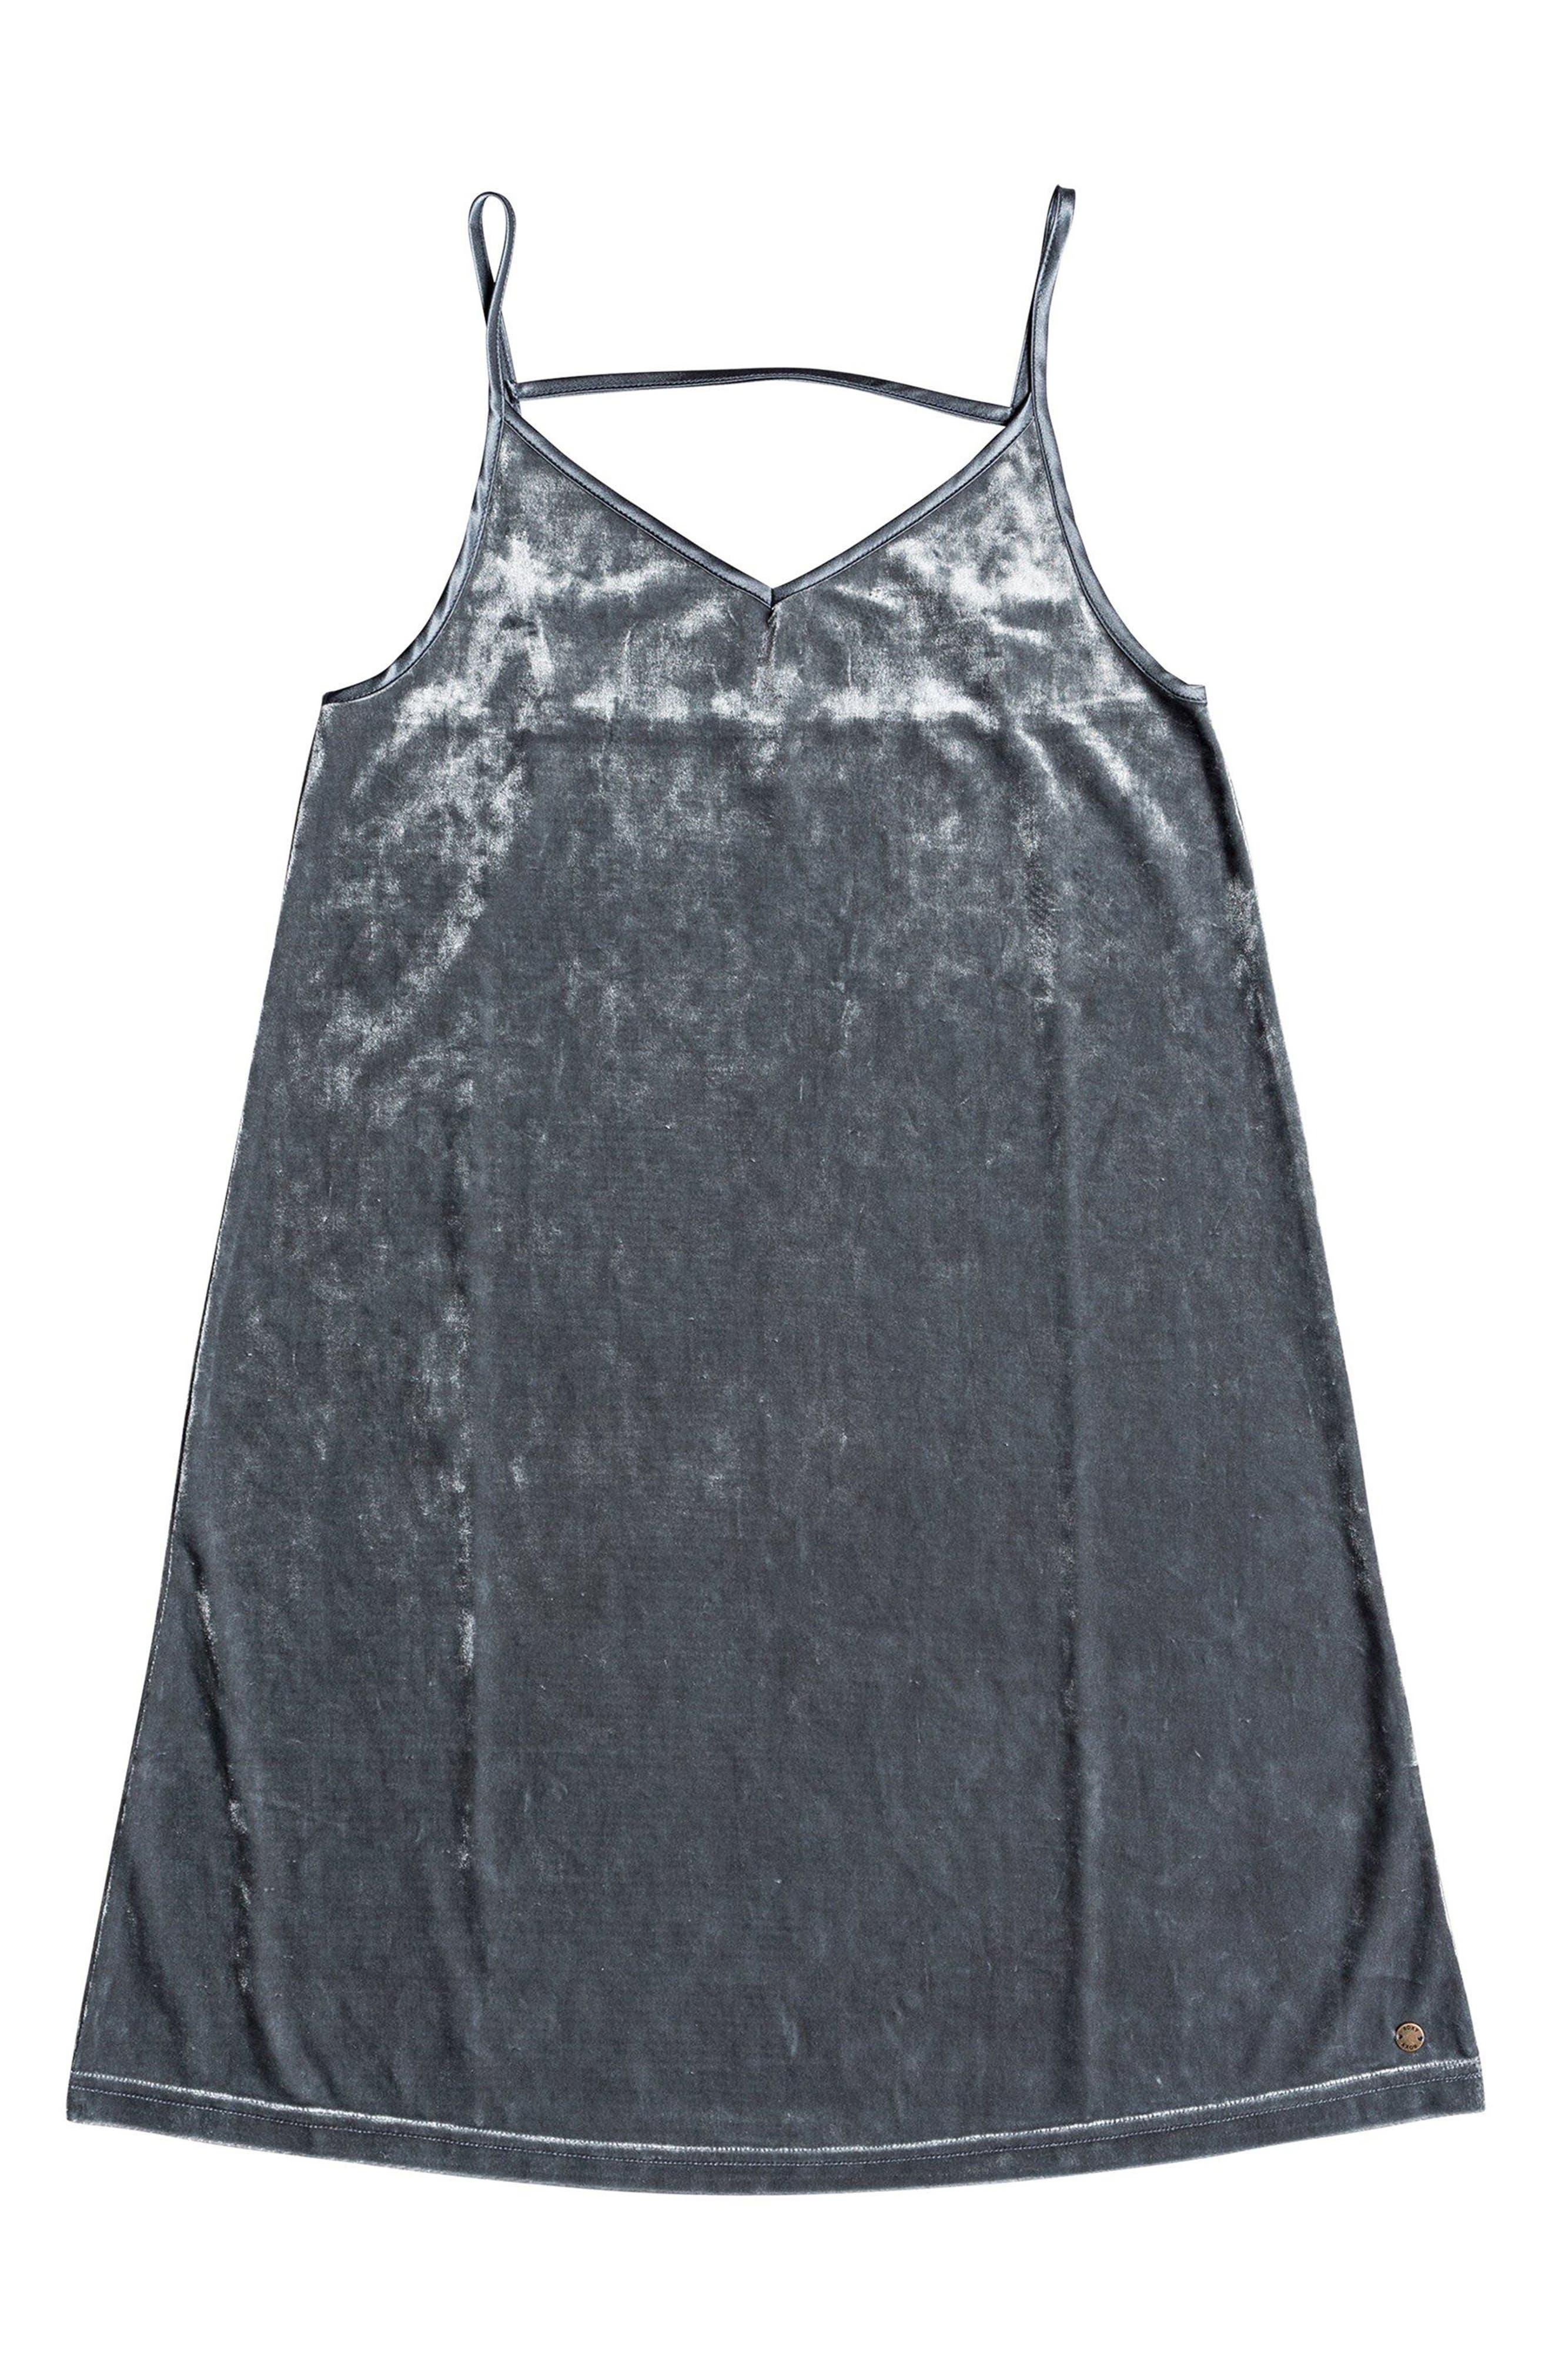 Sleepy Night Crushed Velvet Dress,                             Alternate thumbnail 4, color,                             TURBULENCE